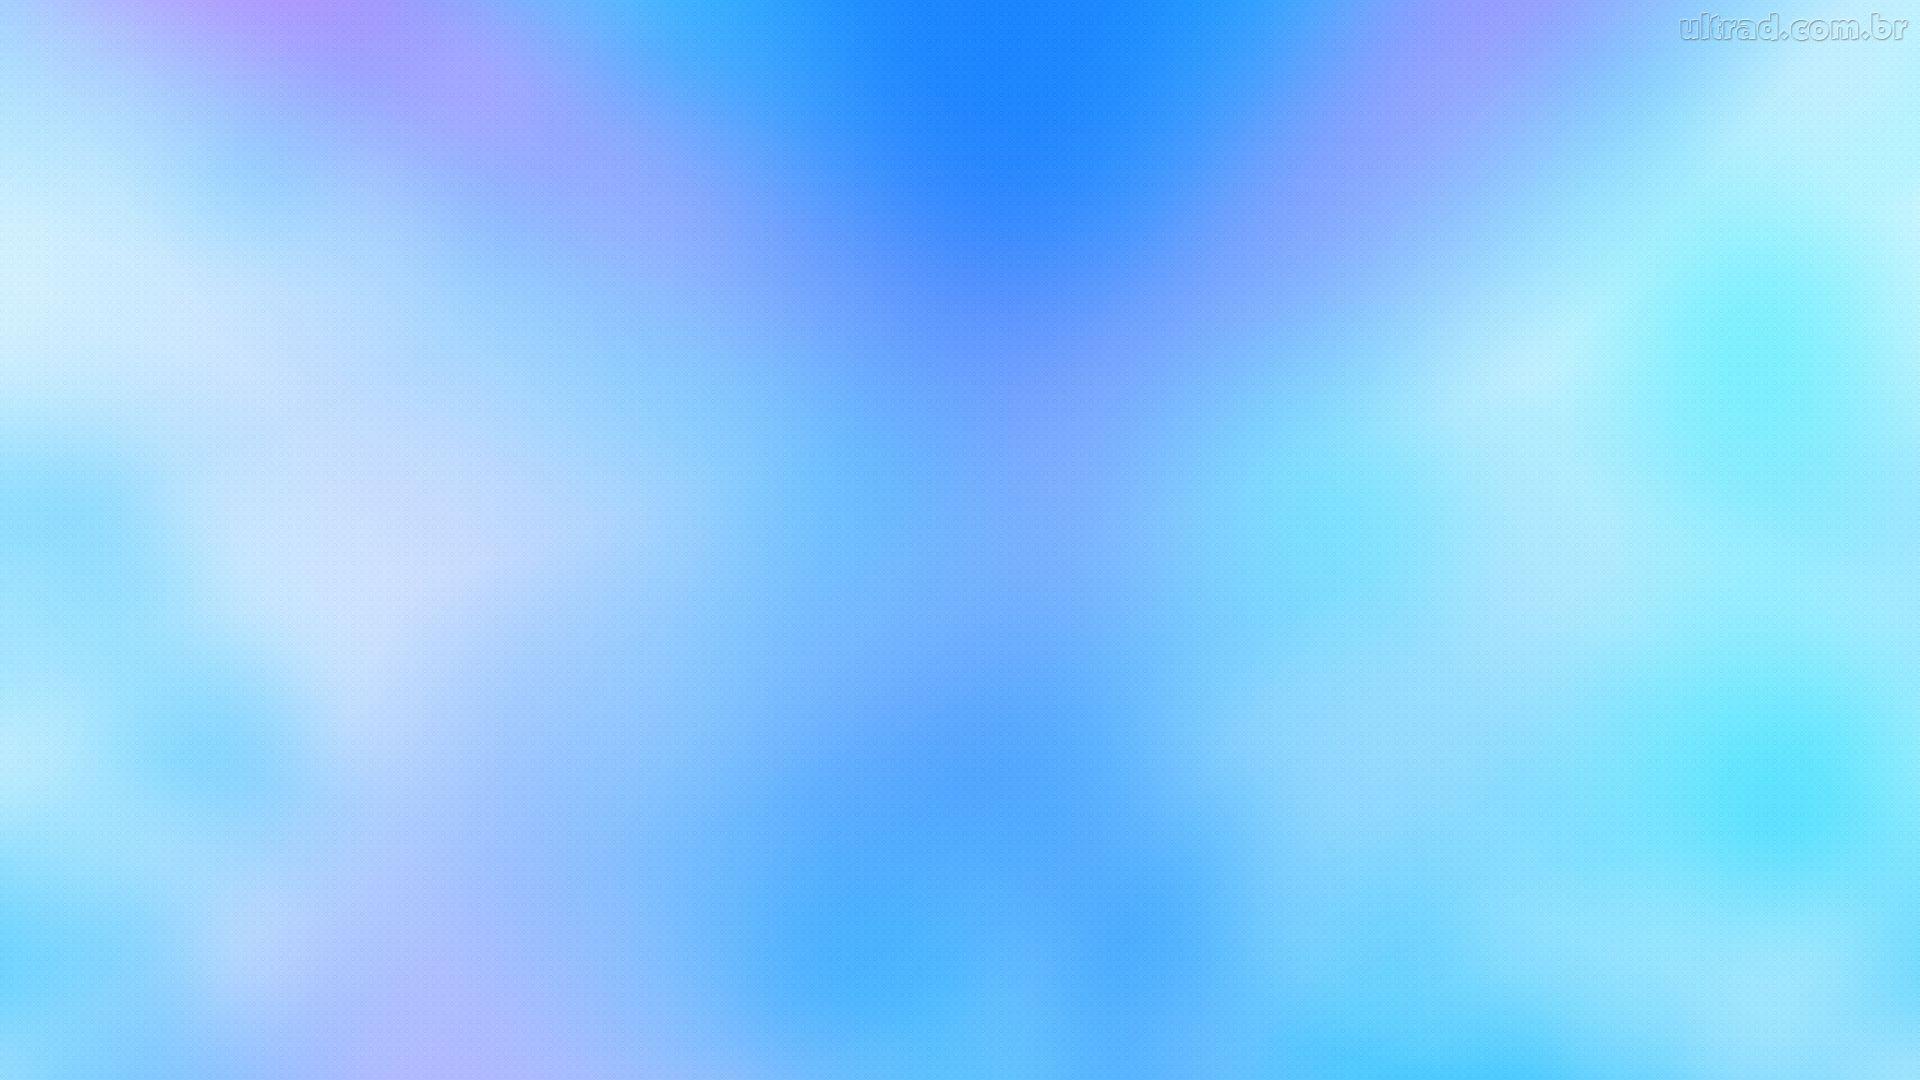 Fundo Claro Planos De Fundo Azul Claro 1366x768 Papel De Parede Azu